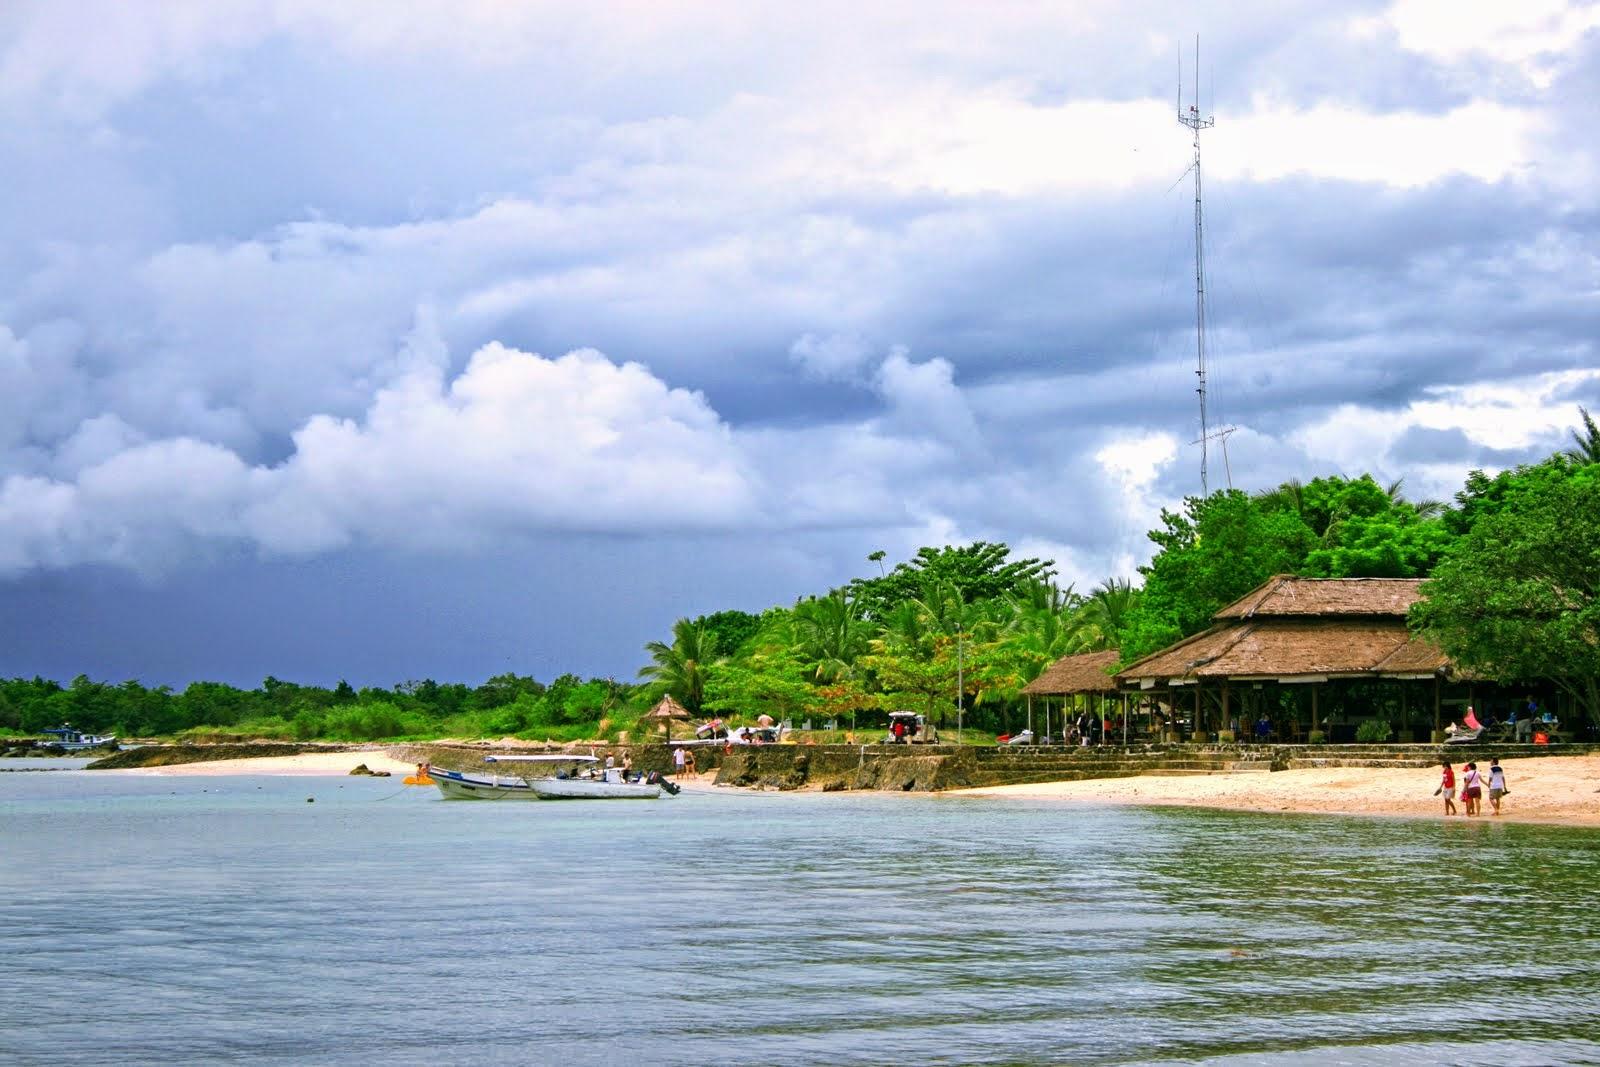 Aja 7 Pantai Pesona Cantik Banten Tanjung Lesung Terletak Kecamatan